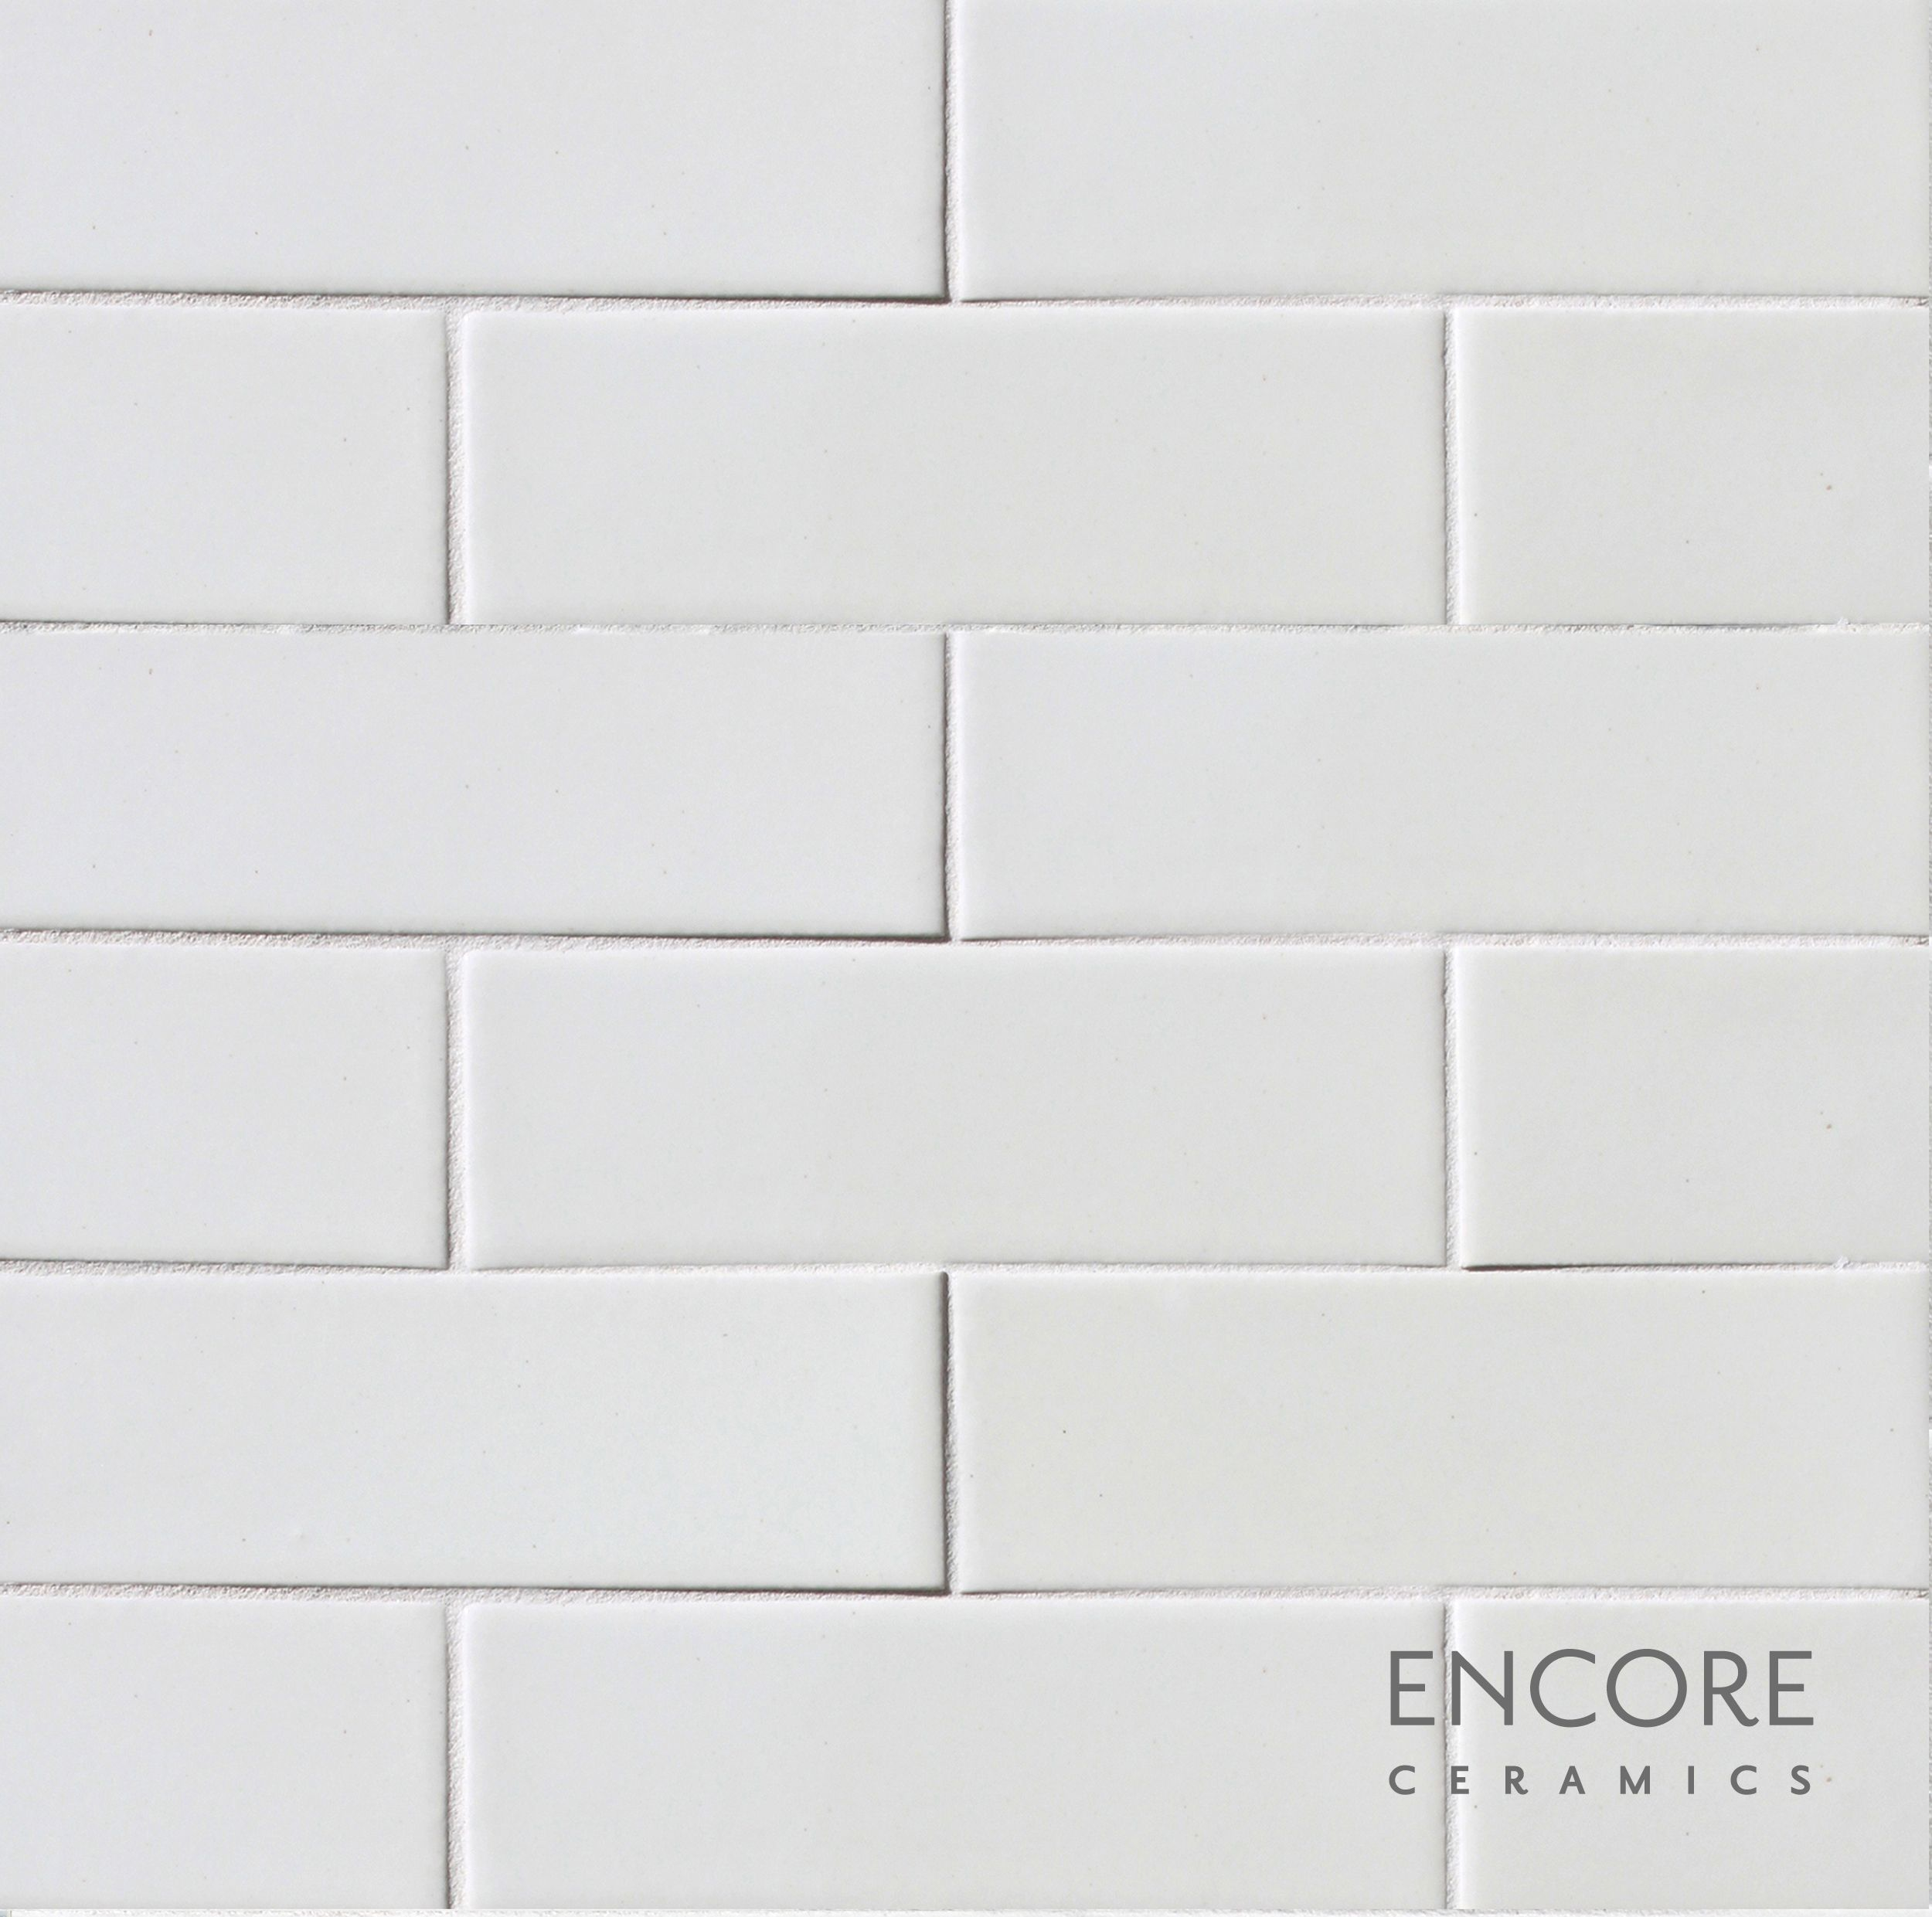 Encore Ceramics 2 X 6 Field Tile Hand Glazed In Milk Gloss Part